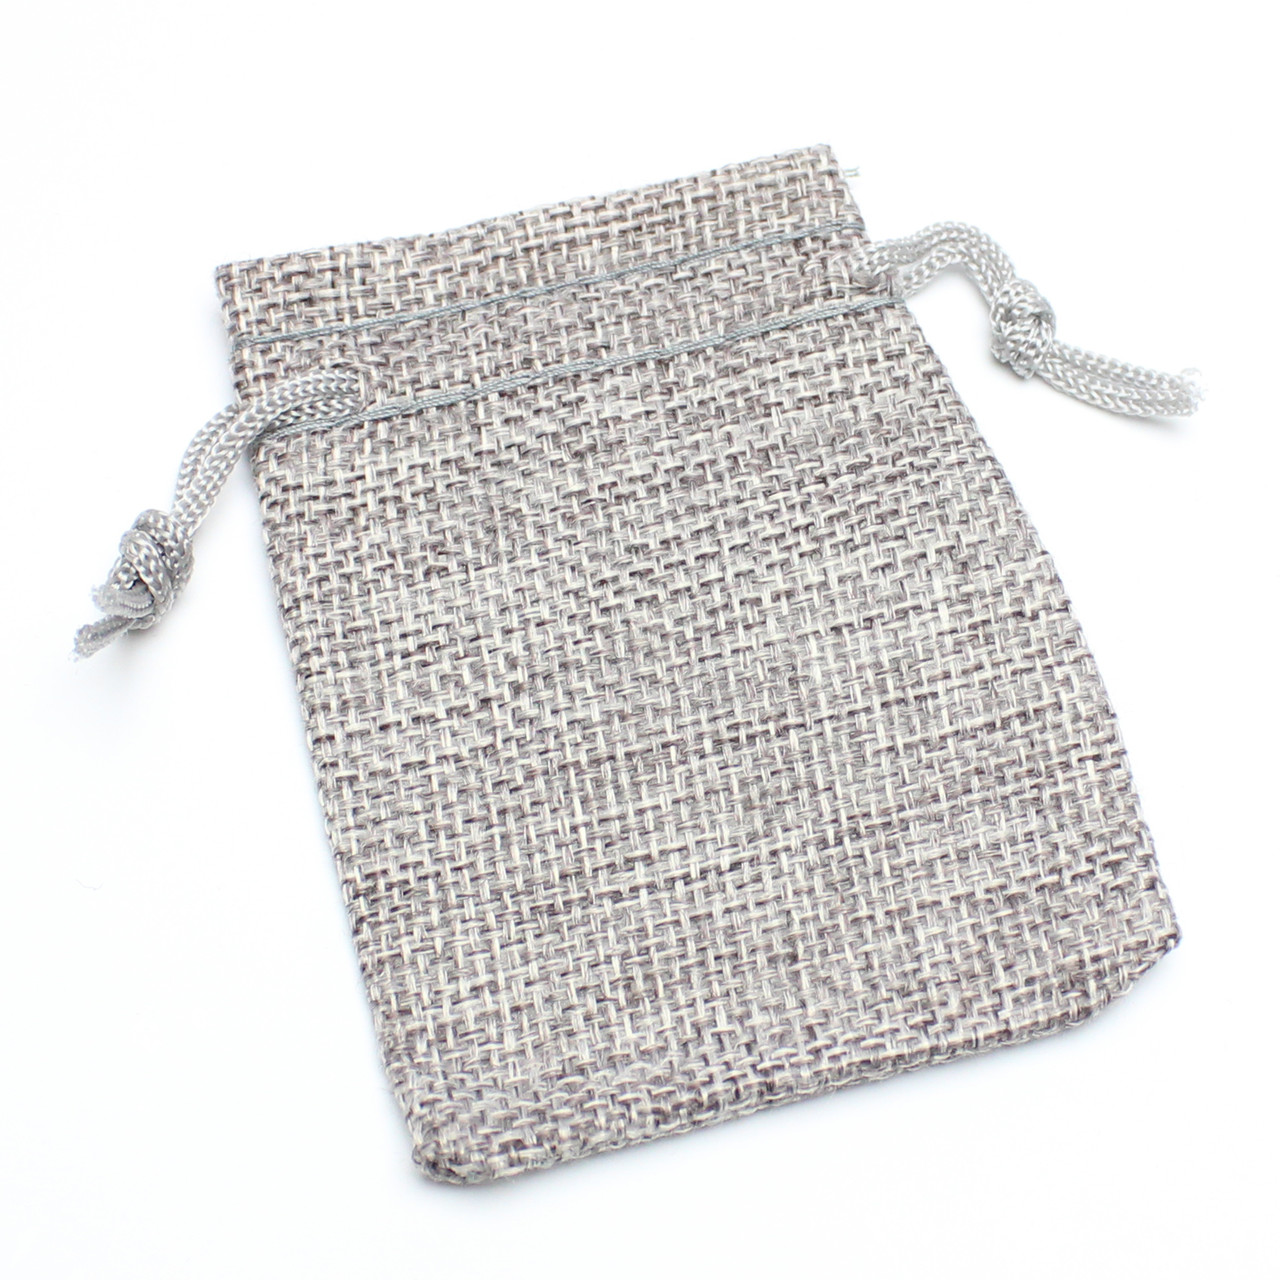 Мешок тканевый лен серый 7/9 см